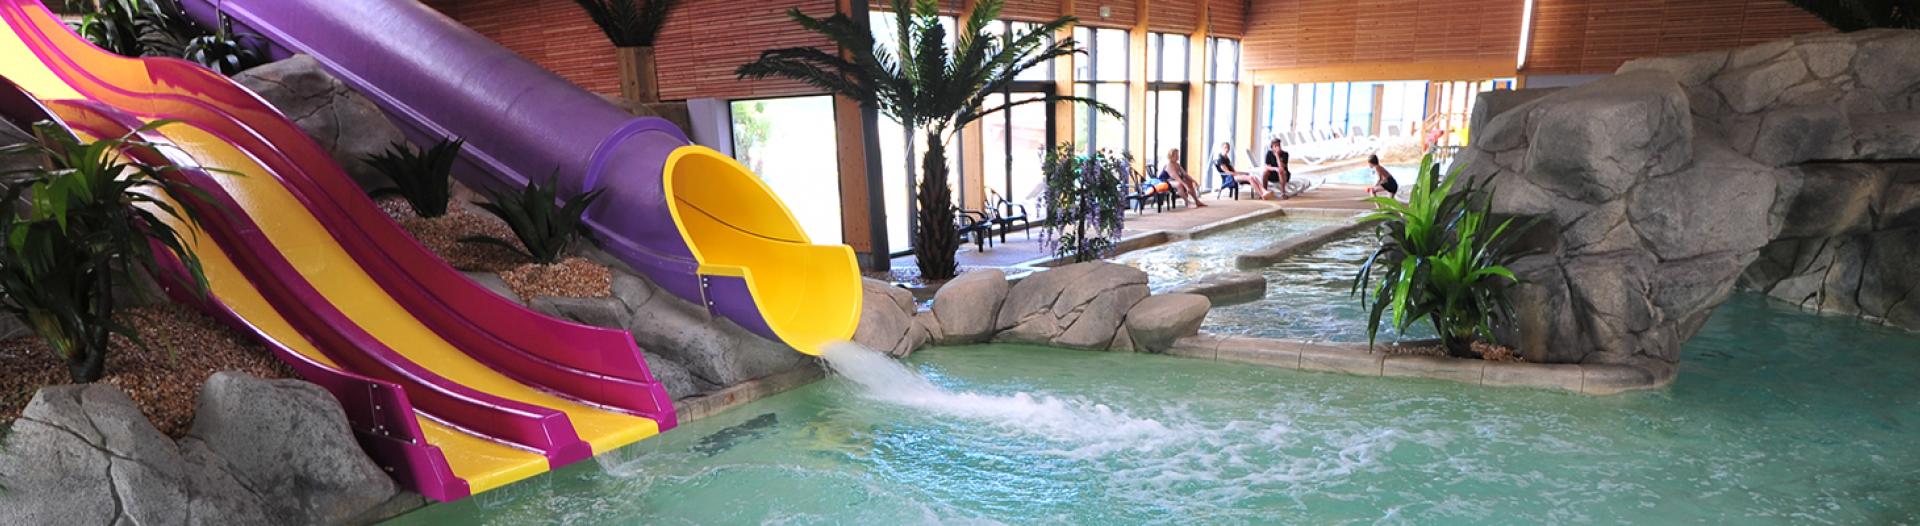 piscine couverte camping ocean - Ile De Re Camping Piscine Couverte